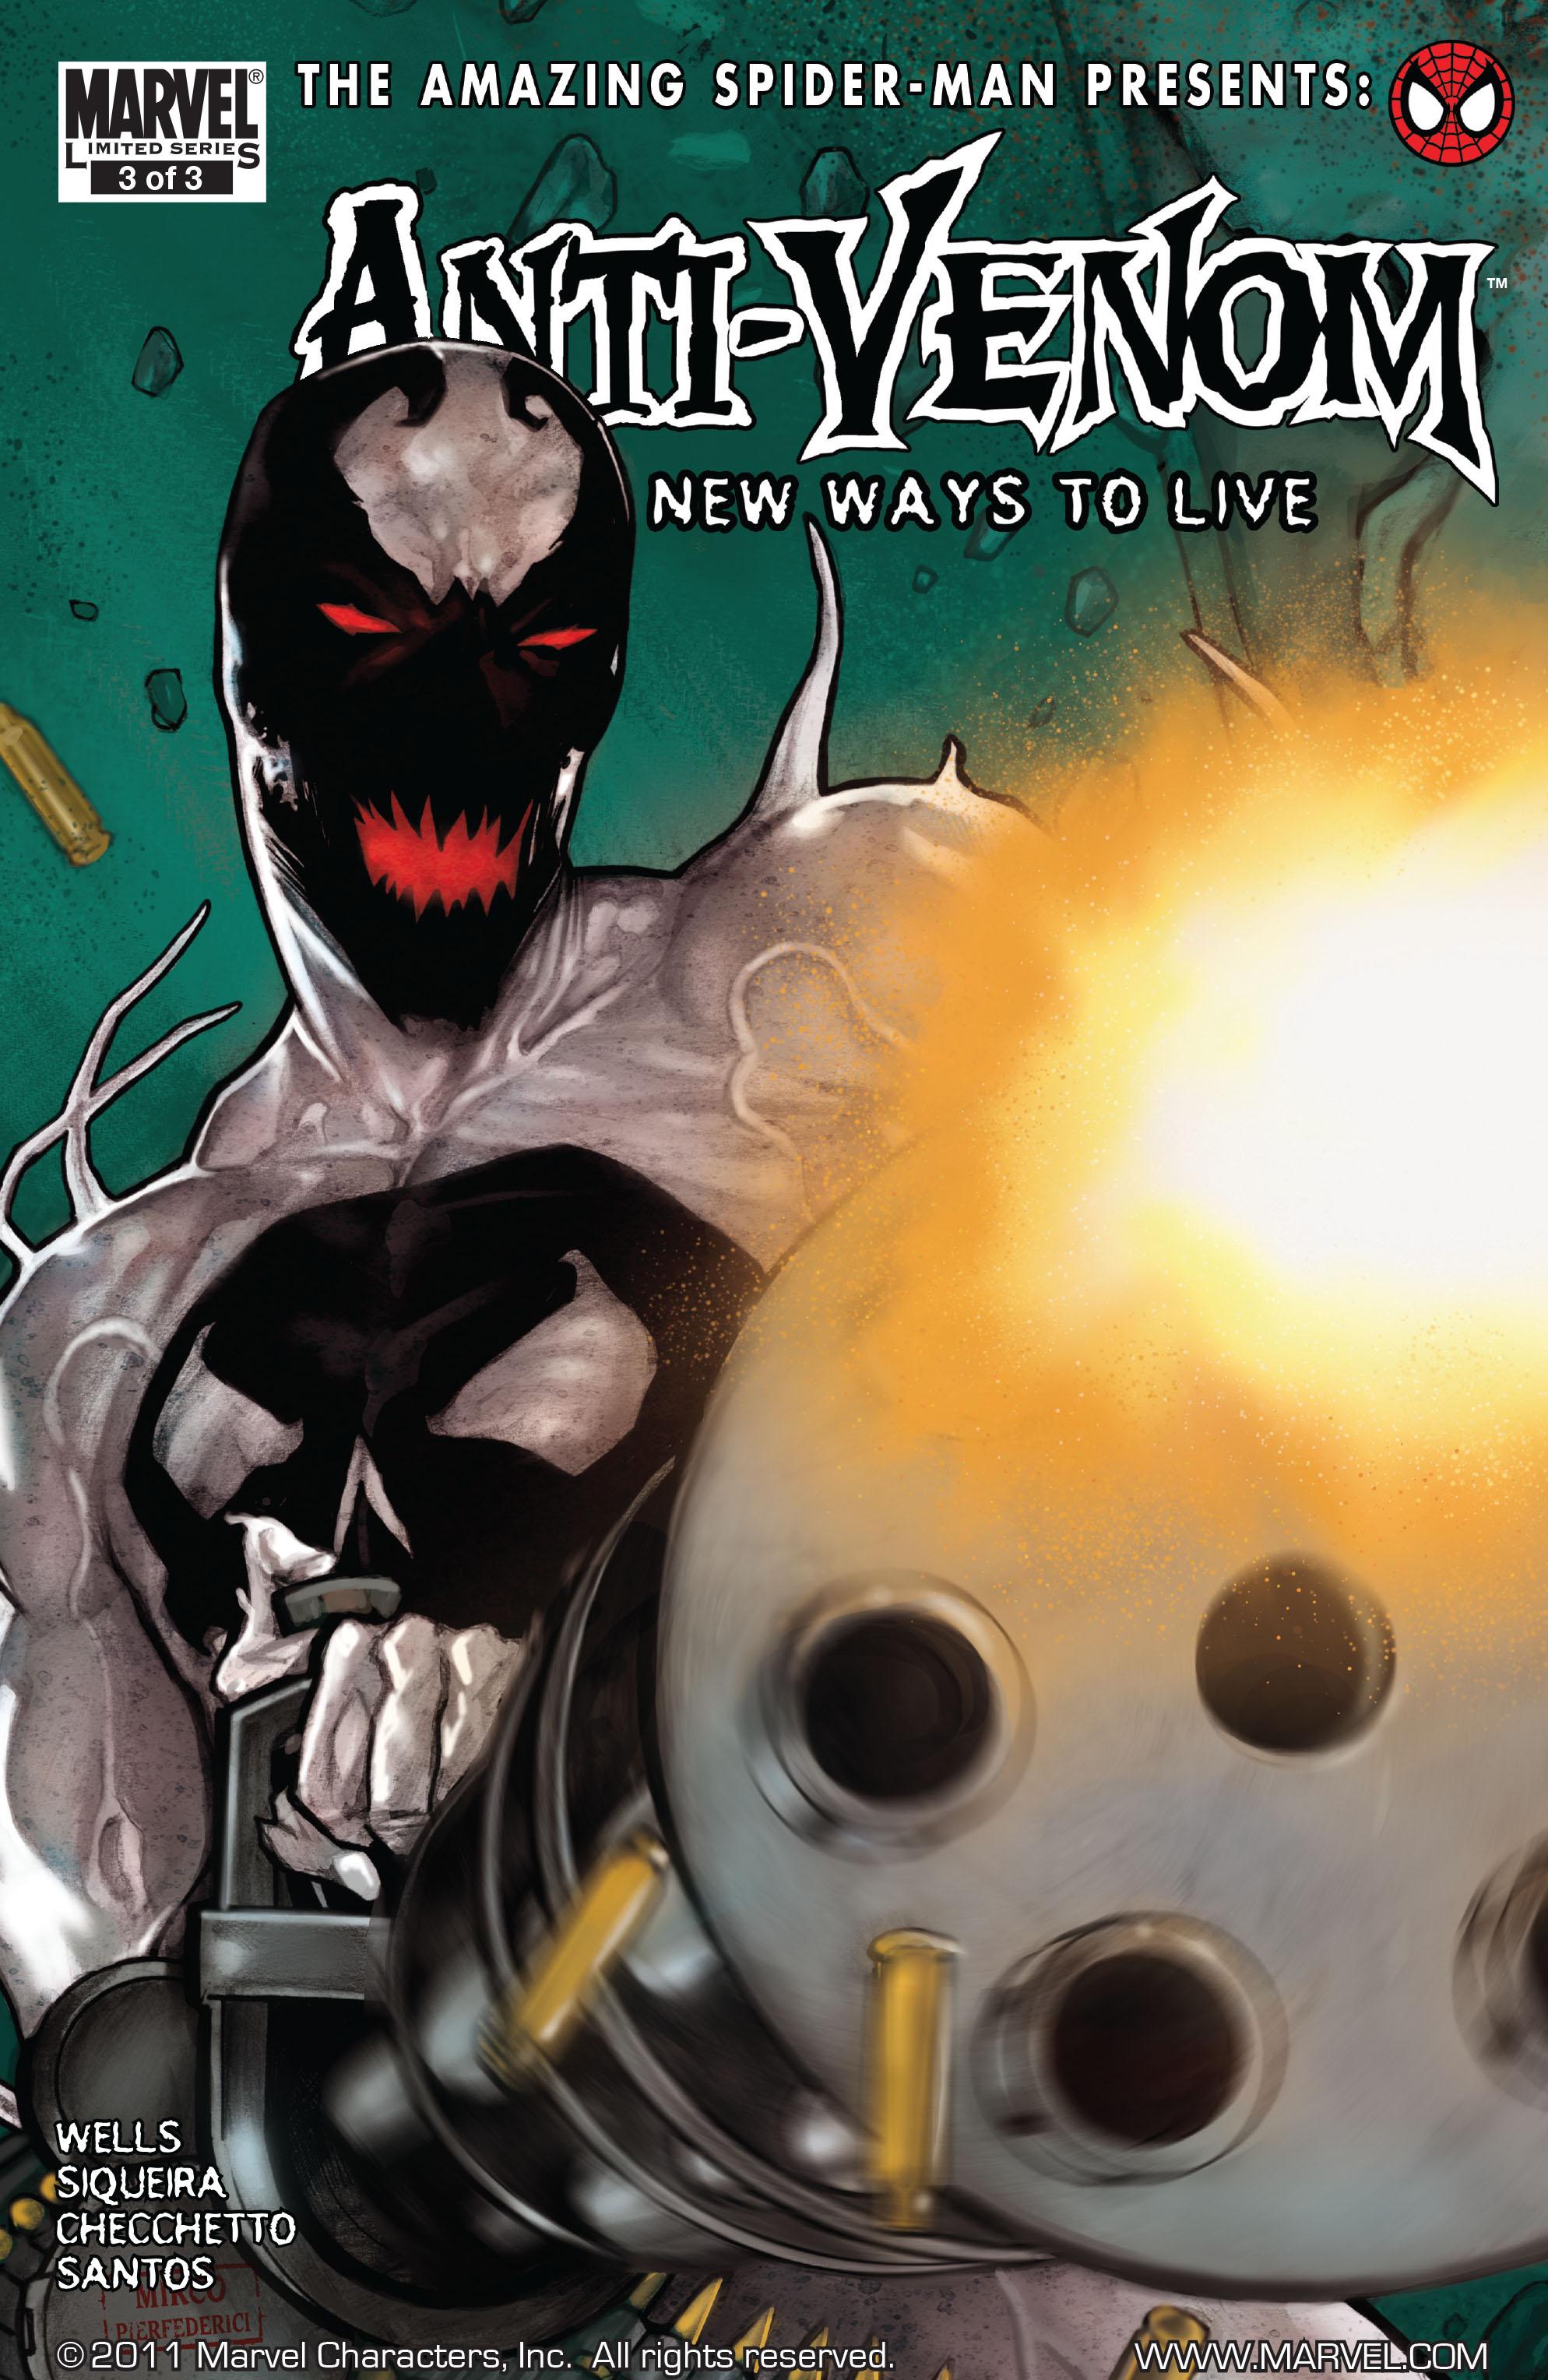 Amazing Spider-Man Presents: Anti-Venom - New Ways To Live 3 Page 1